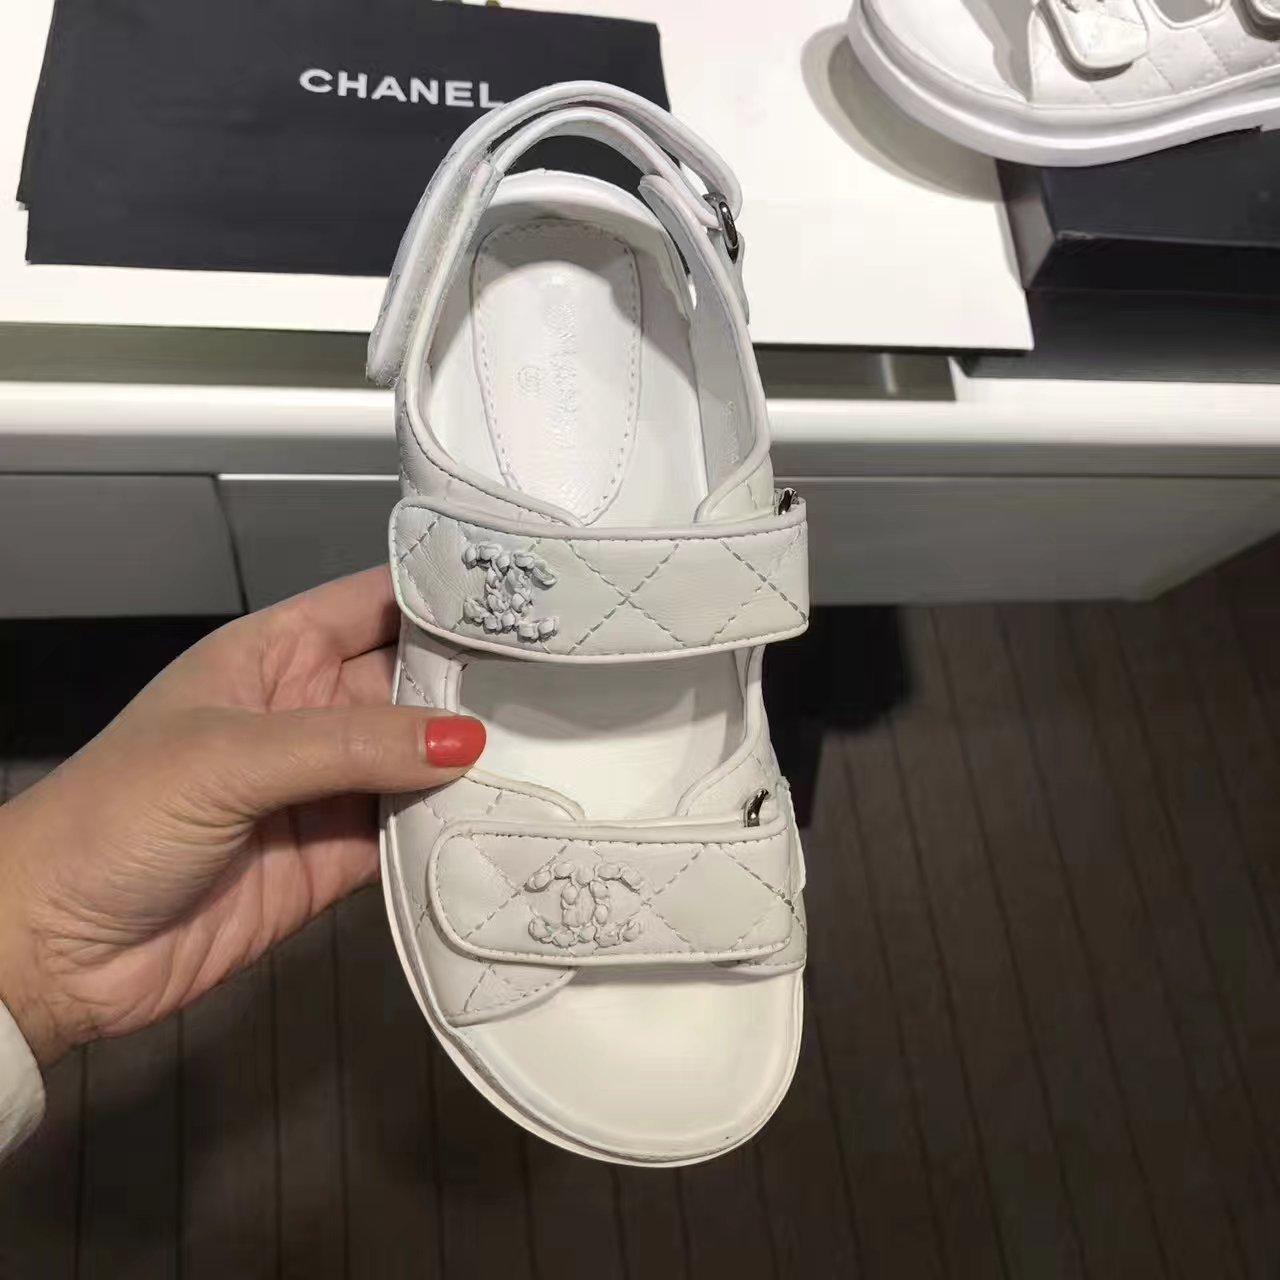 Chanel凉鞋 17春夏走秀系列女款凉鞋!